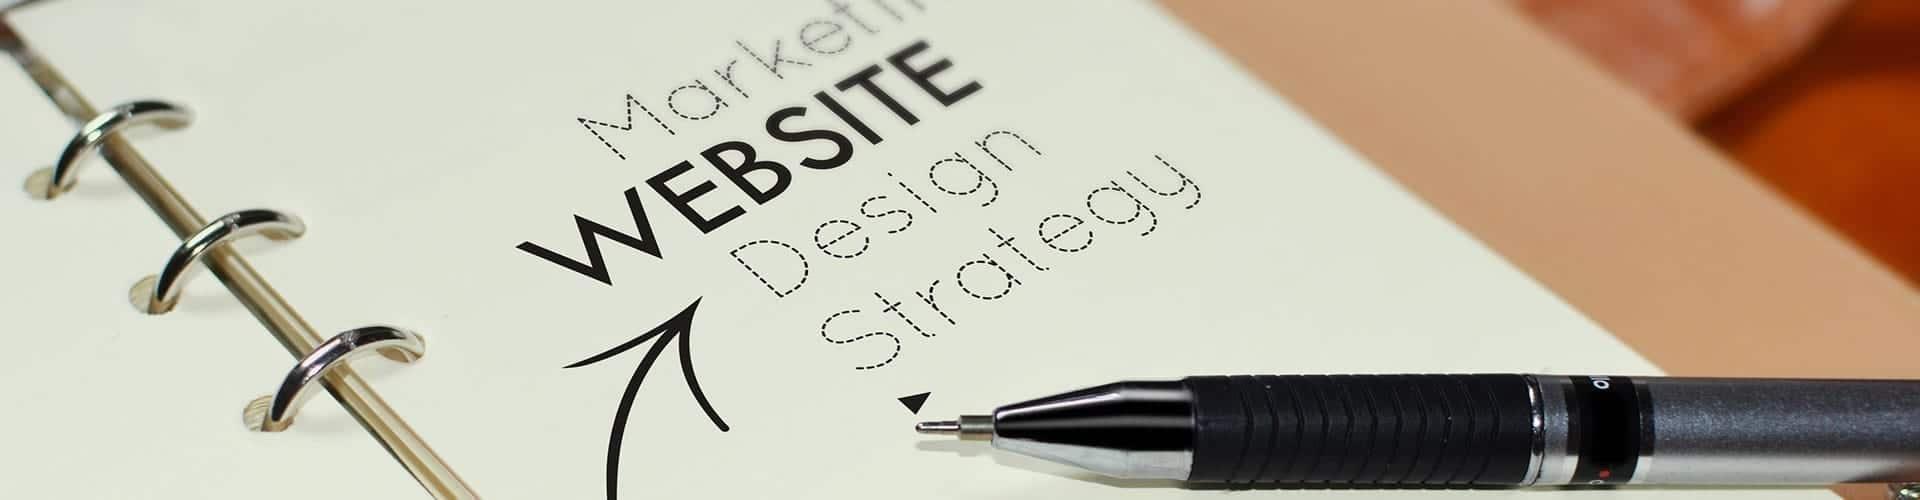 Samui Infotech - Web Design